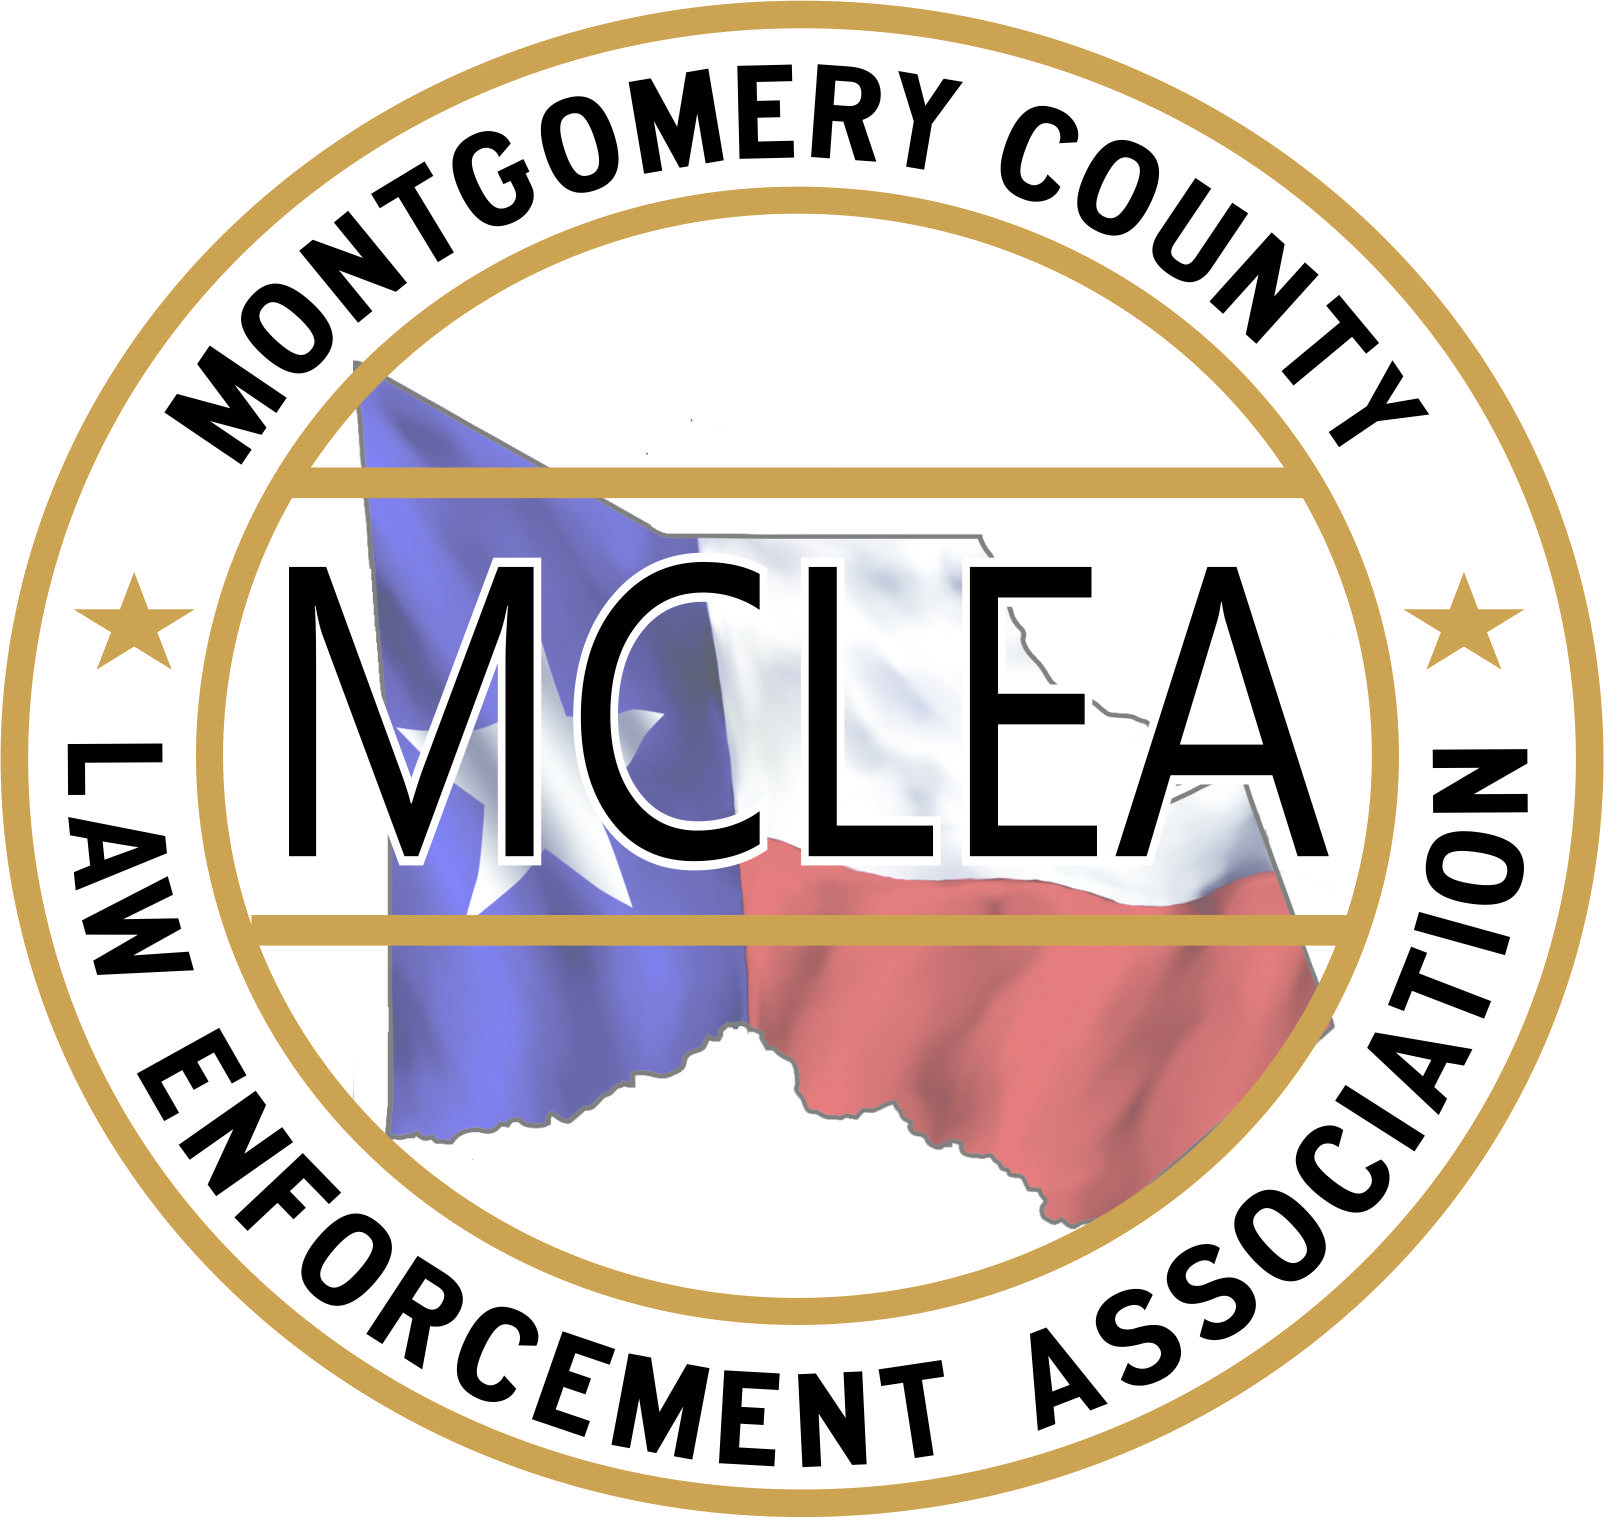 mclea logo new.jpg